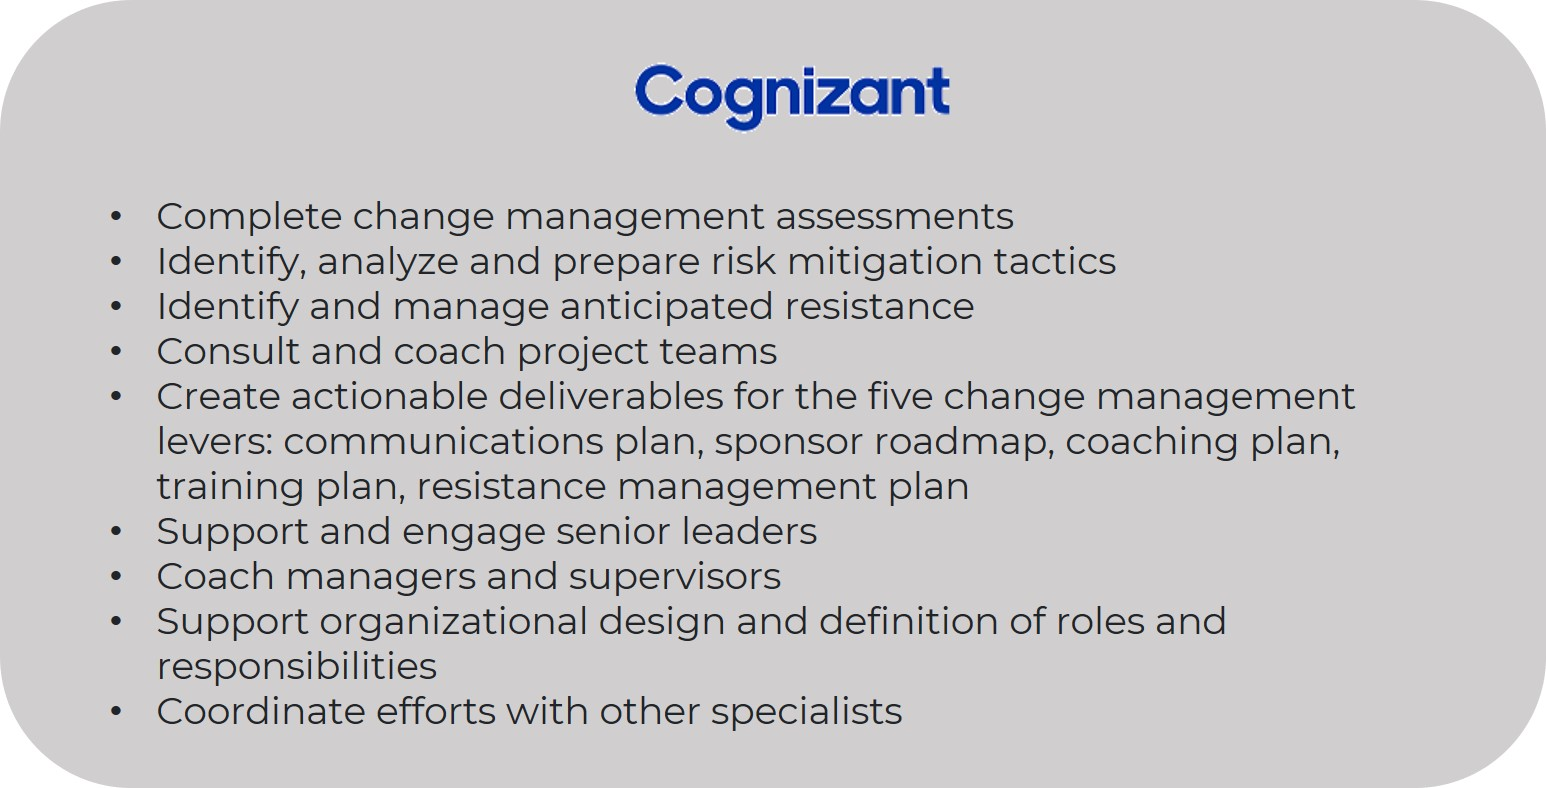 Cognizant Change Manager Resume - Change Manager Resume - Invensis Learning